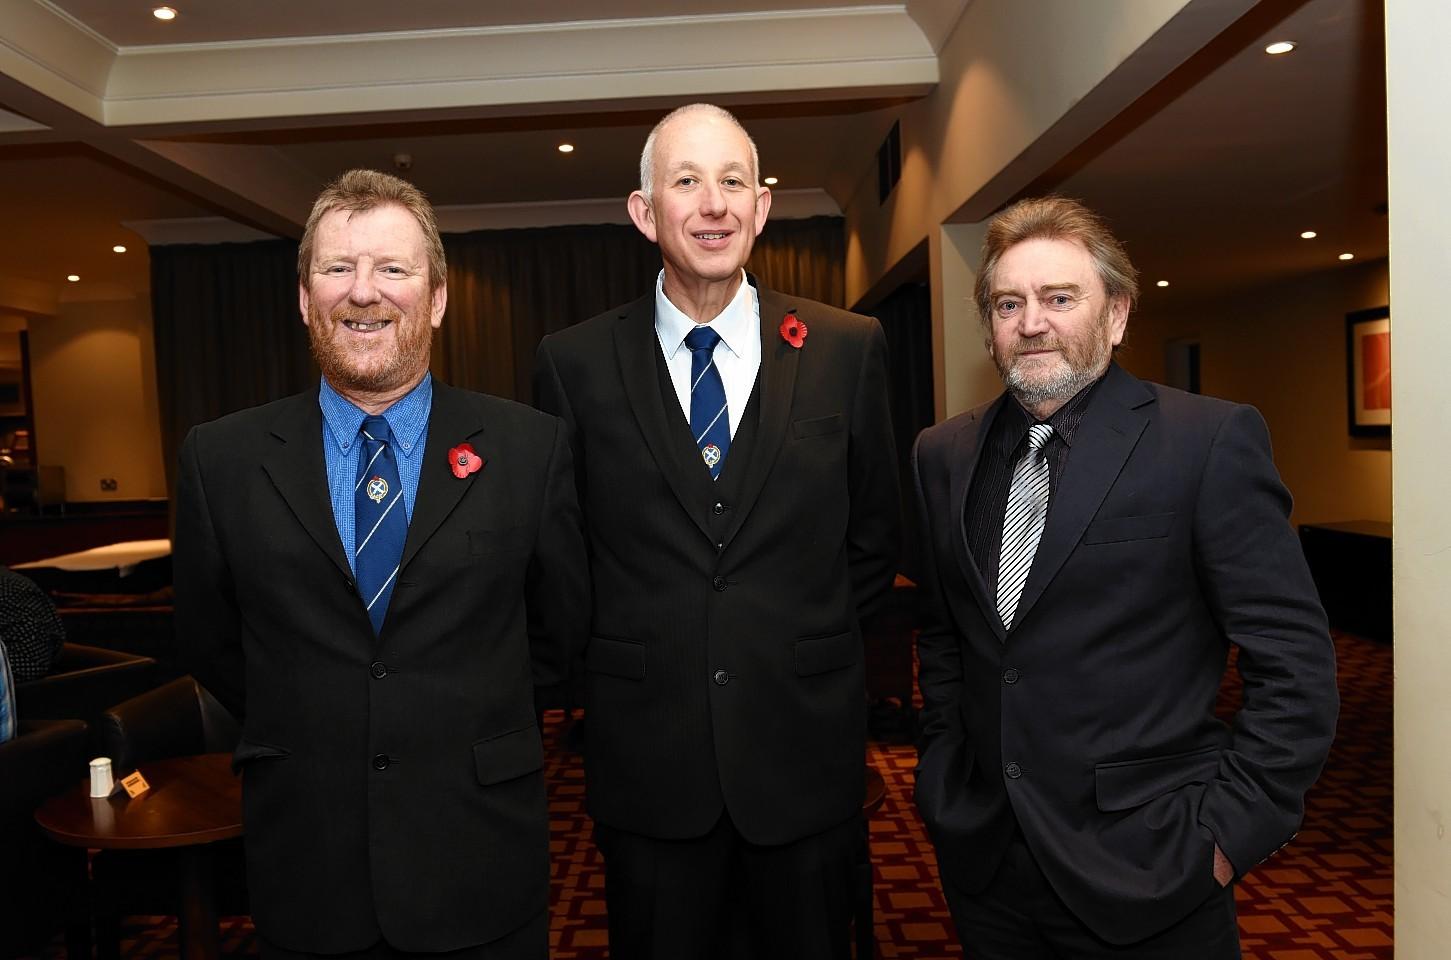 Iain MacIntosh, Grant Munro and David Orr